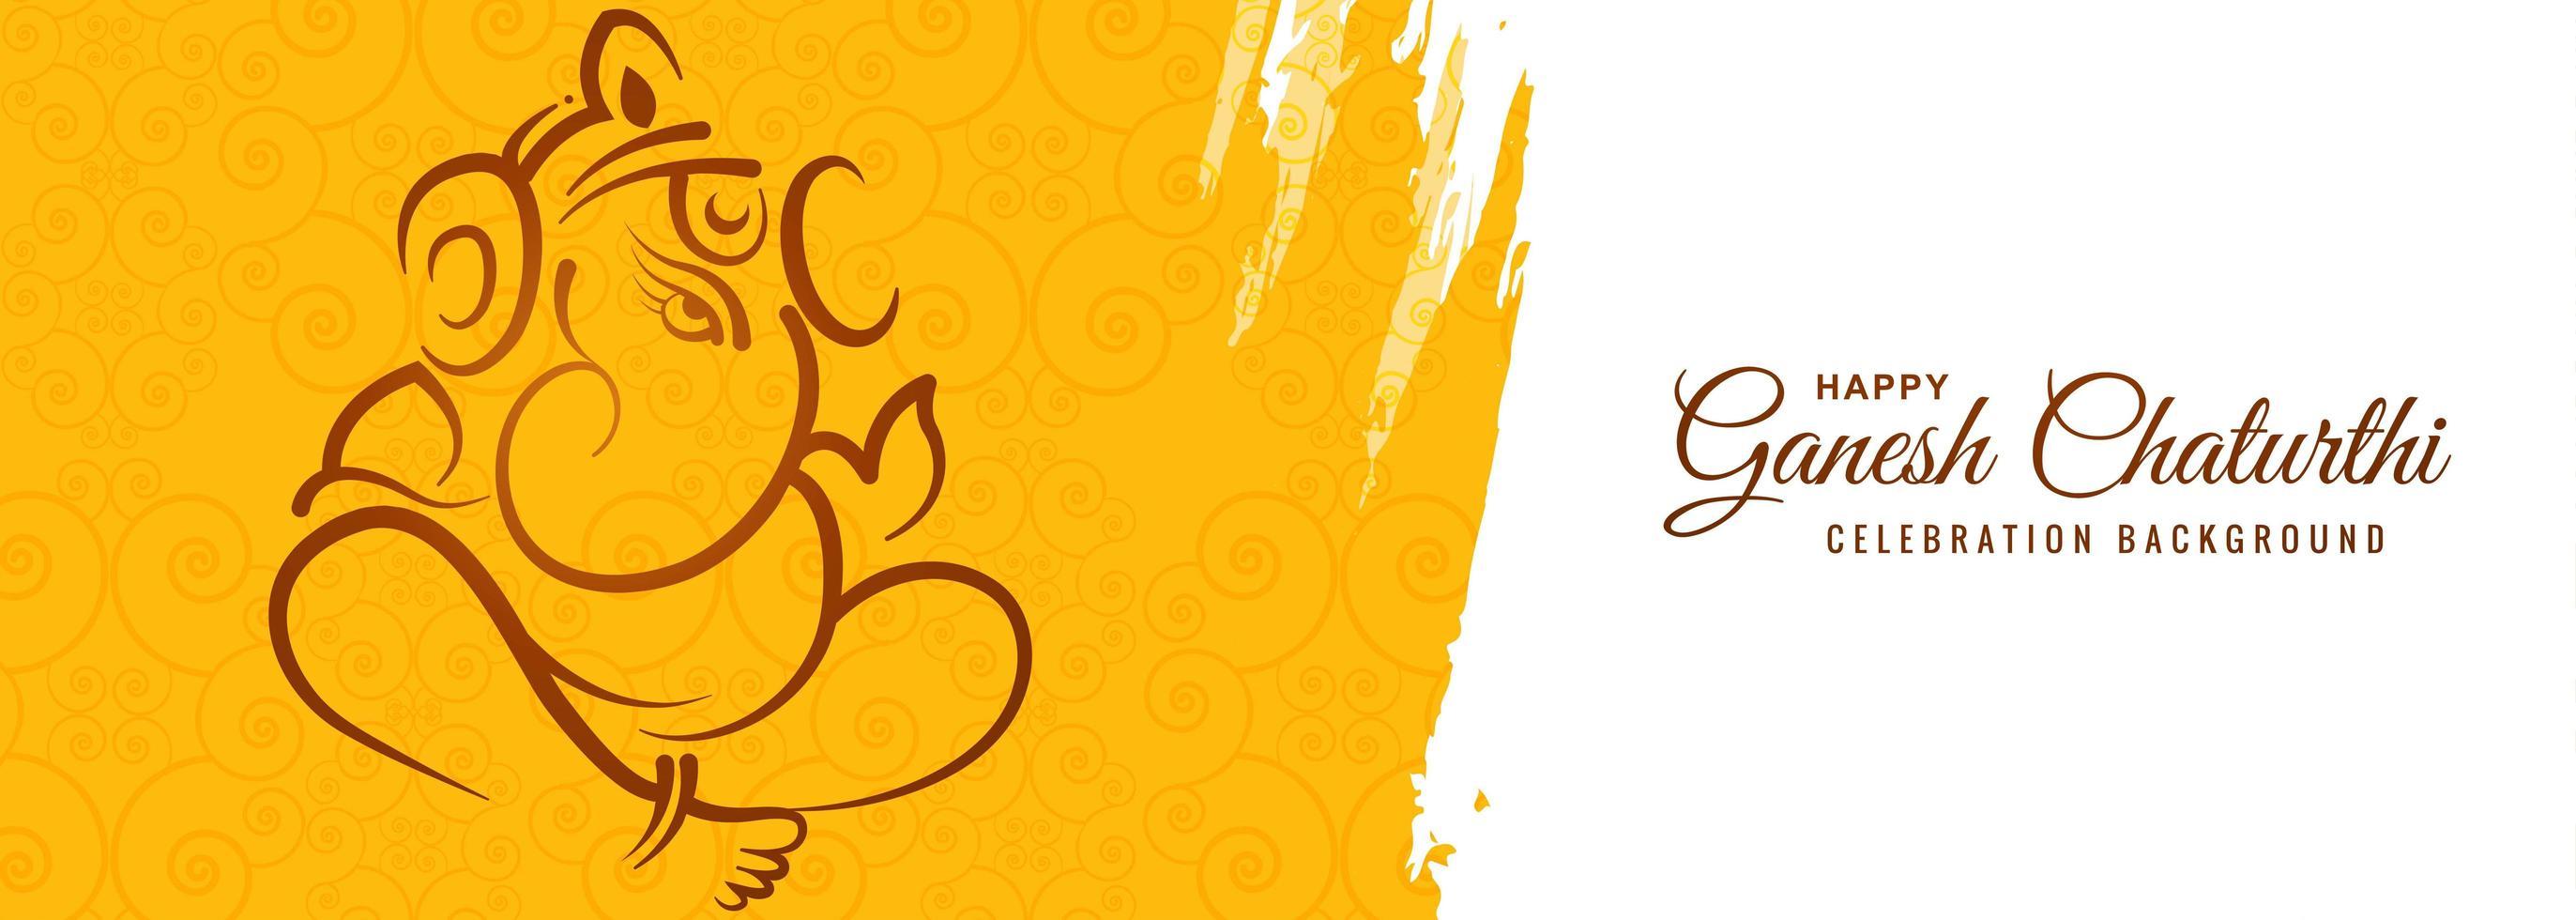 banner de cartão festival feliz ganesh chaturthi pintura amarela vetor